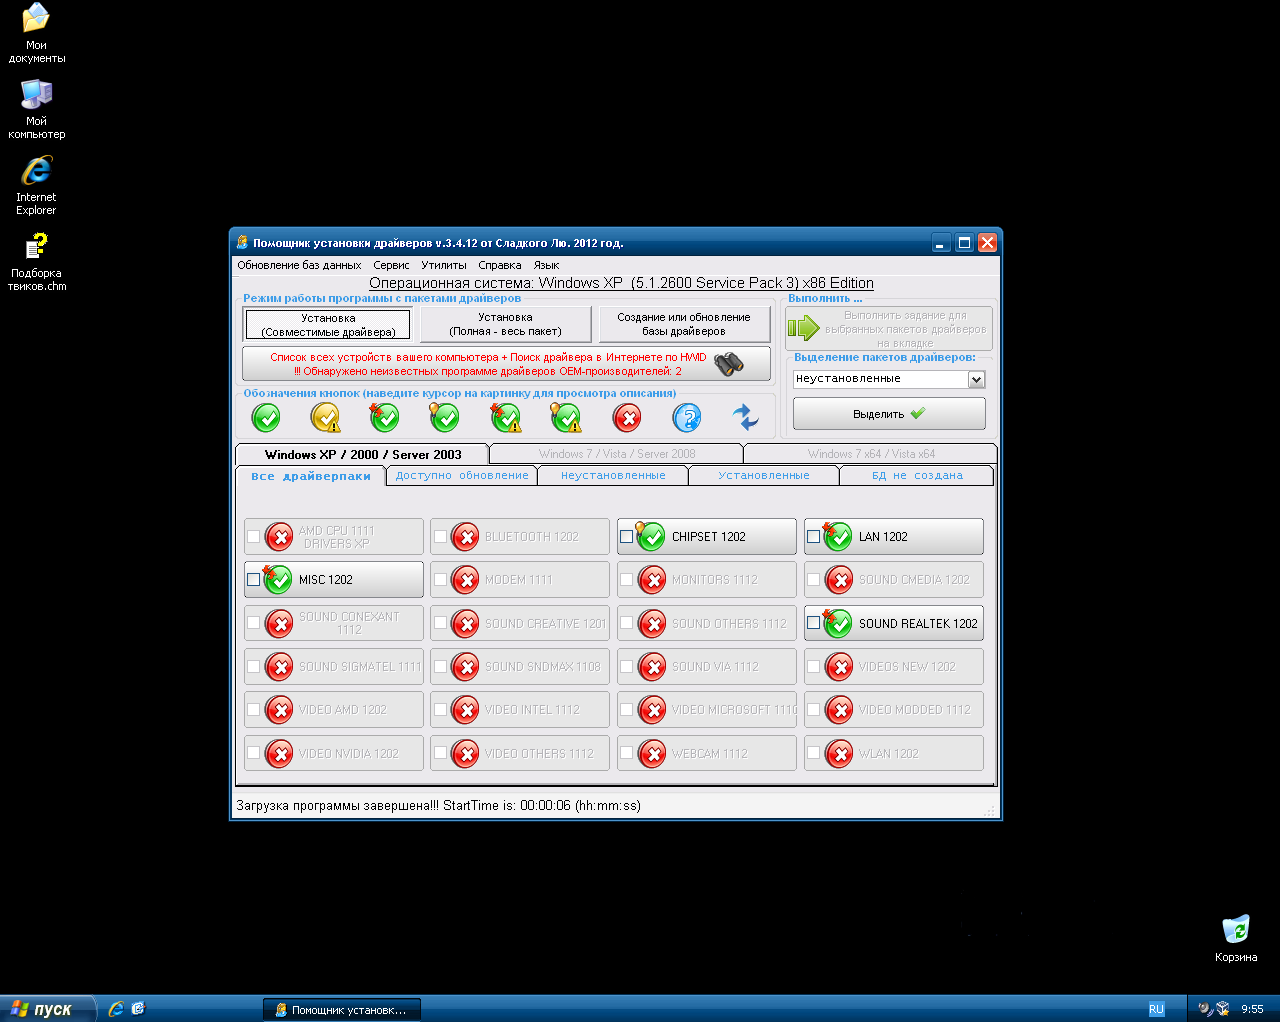 windows xp x64 sp3 torrent